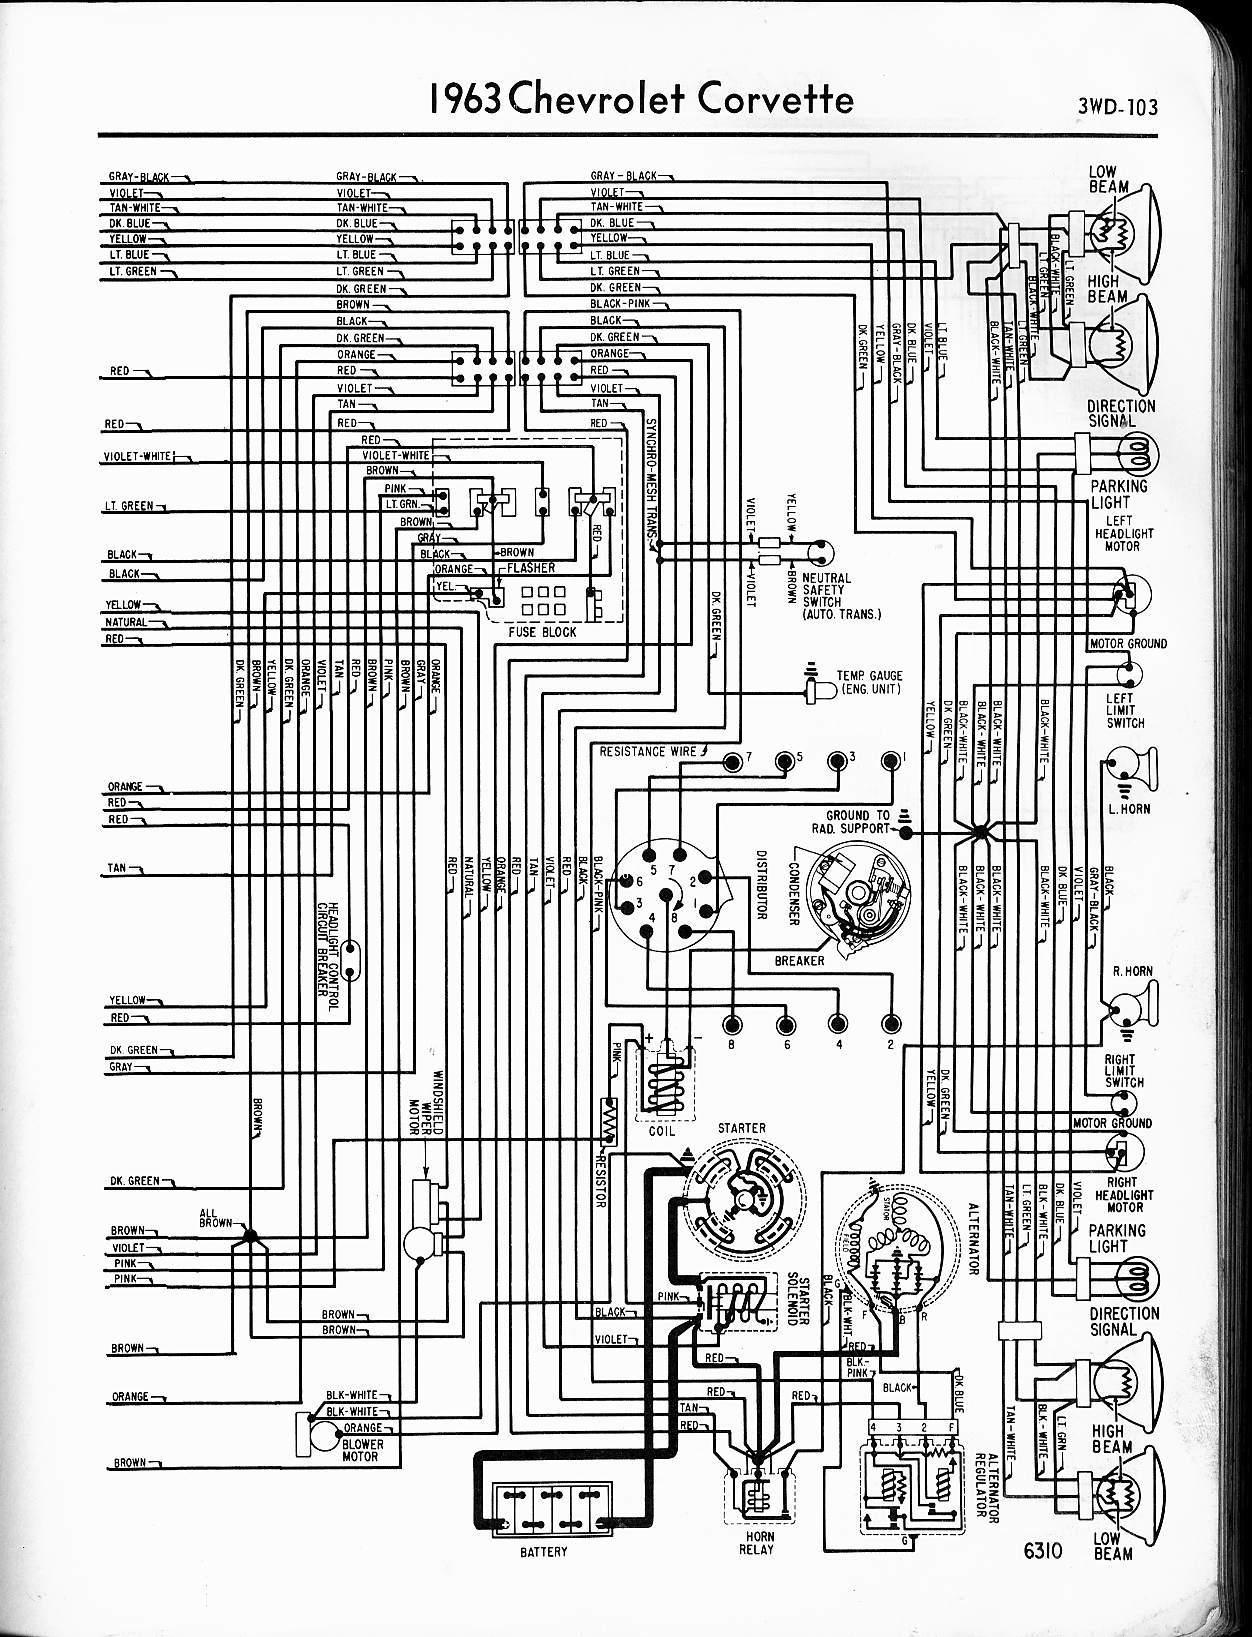 hight resolution of 94 chevy corvette wiring diagram circuit diagram wiring diagram 1985 chevy corvette wiring diagram premium